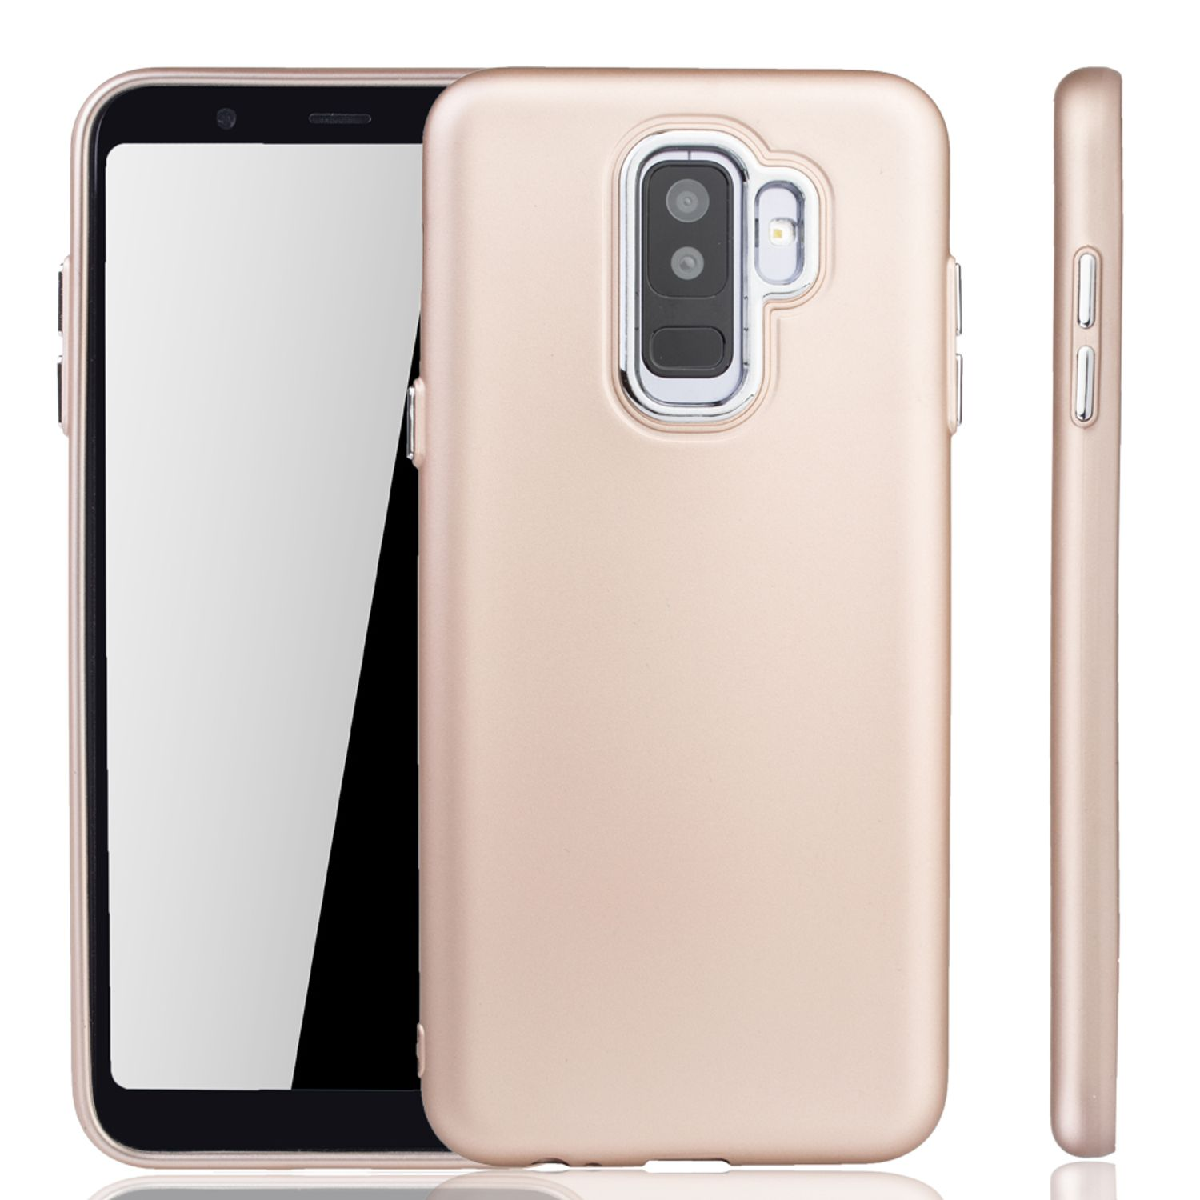 Samsung Galaxy A6 Plus Hulle Handyhulle Fur Samsung Galaxy A6 Plus